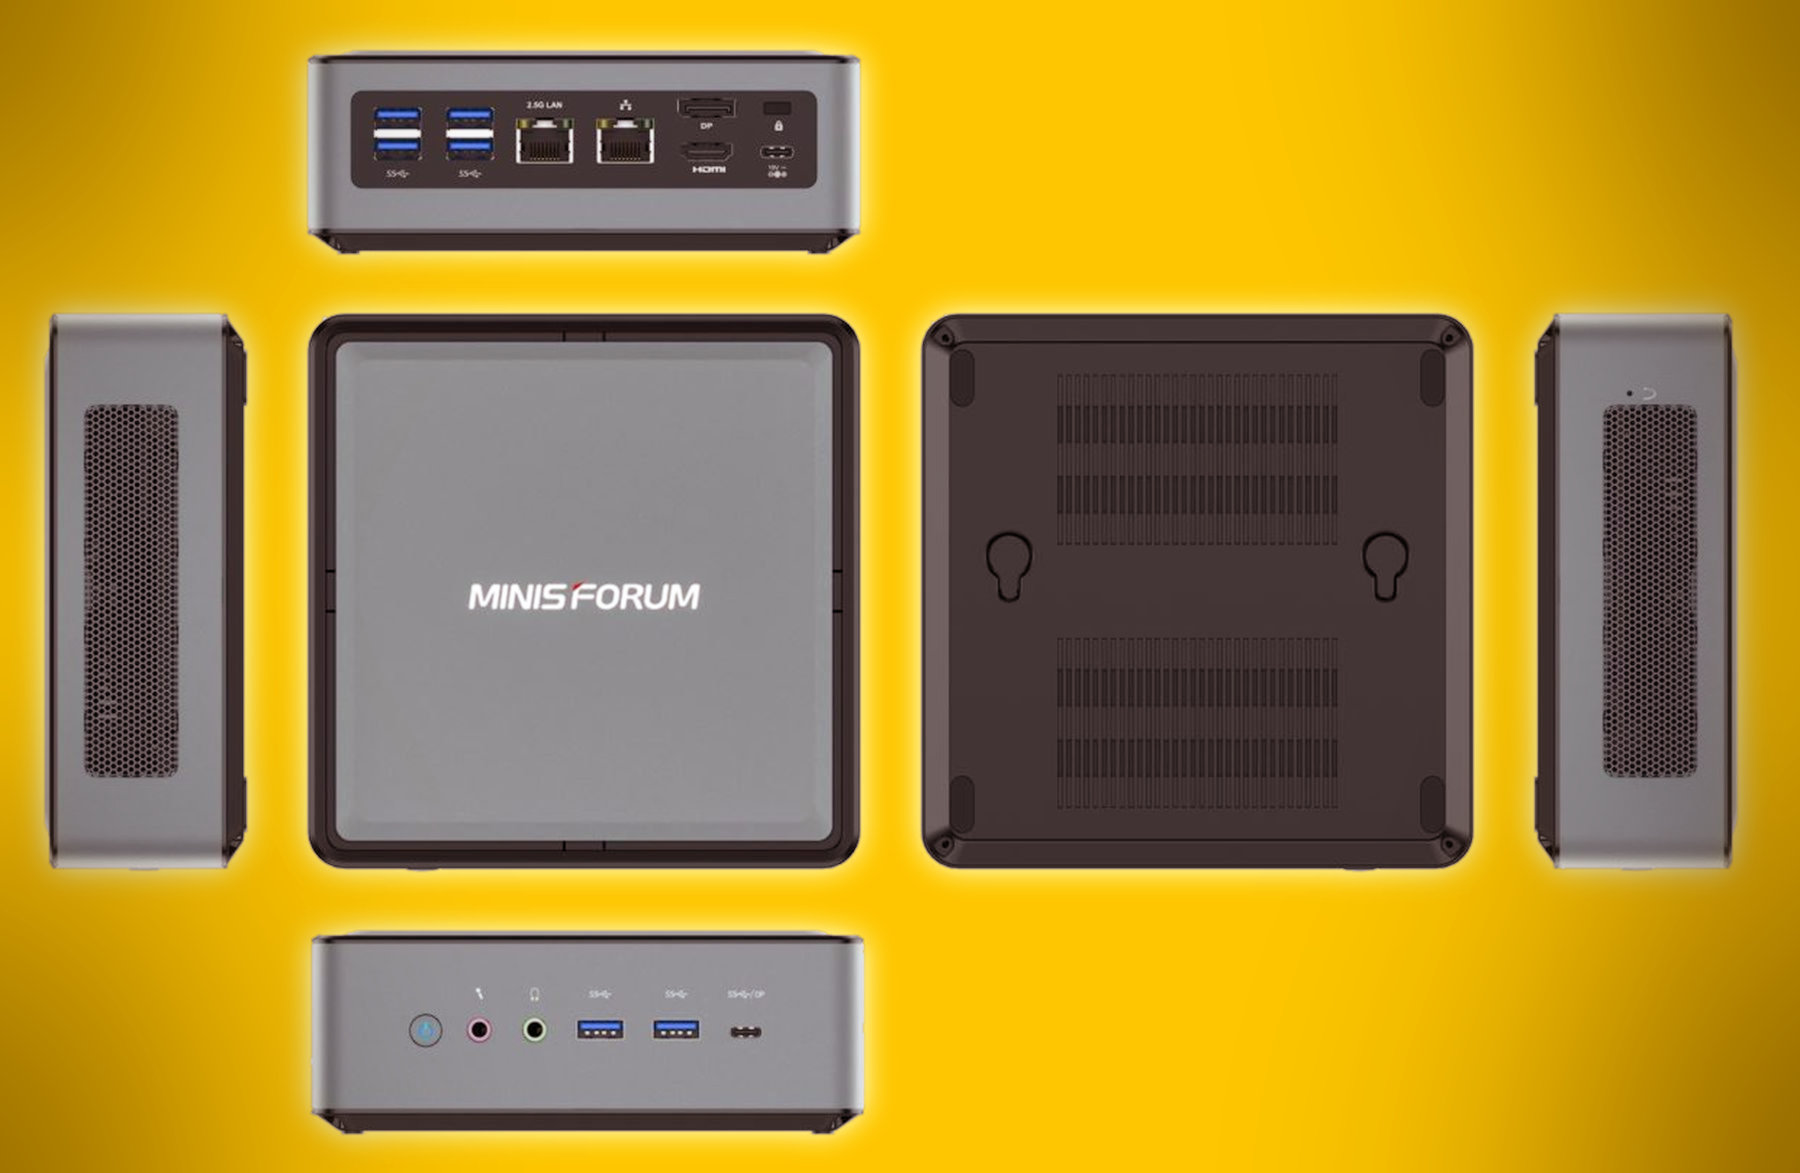 Minisforum announces HM50 mini-PC with AMD Ryzen 5 4500U CPU – VideoCardz.com